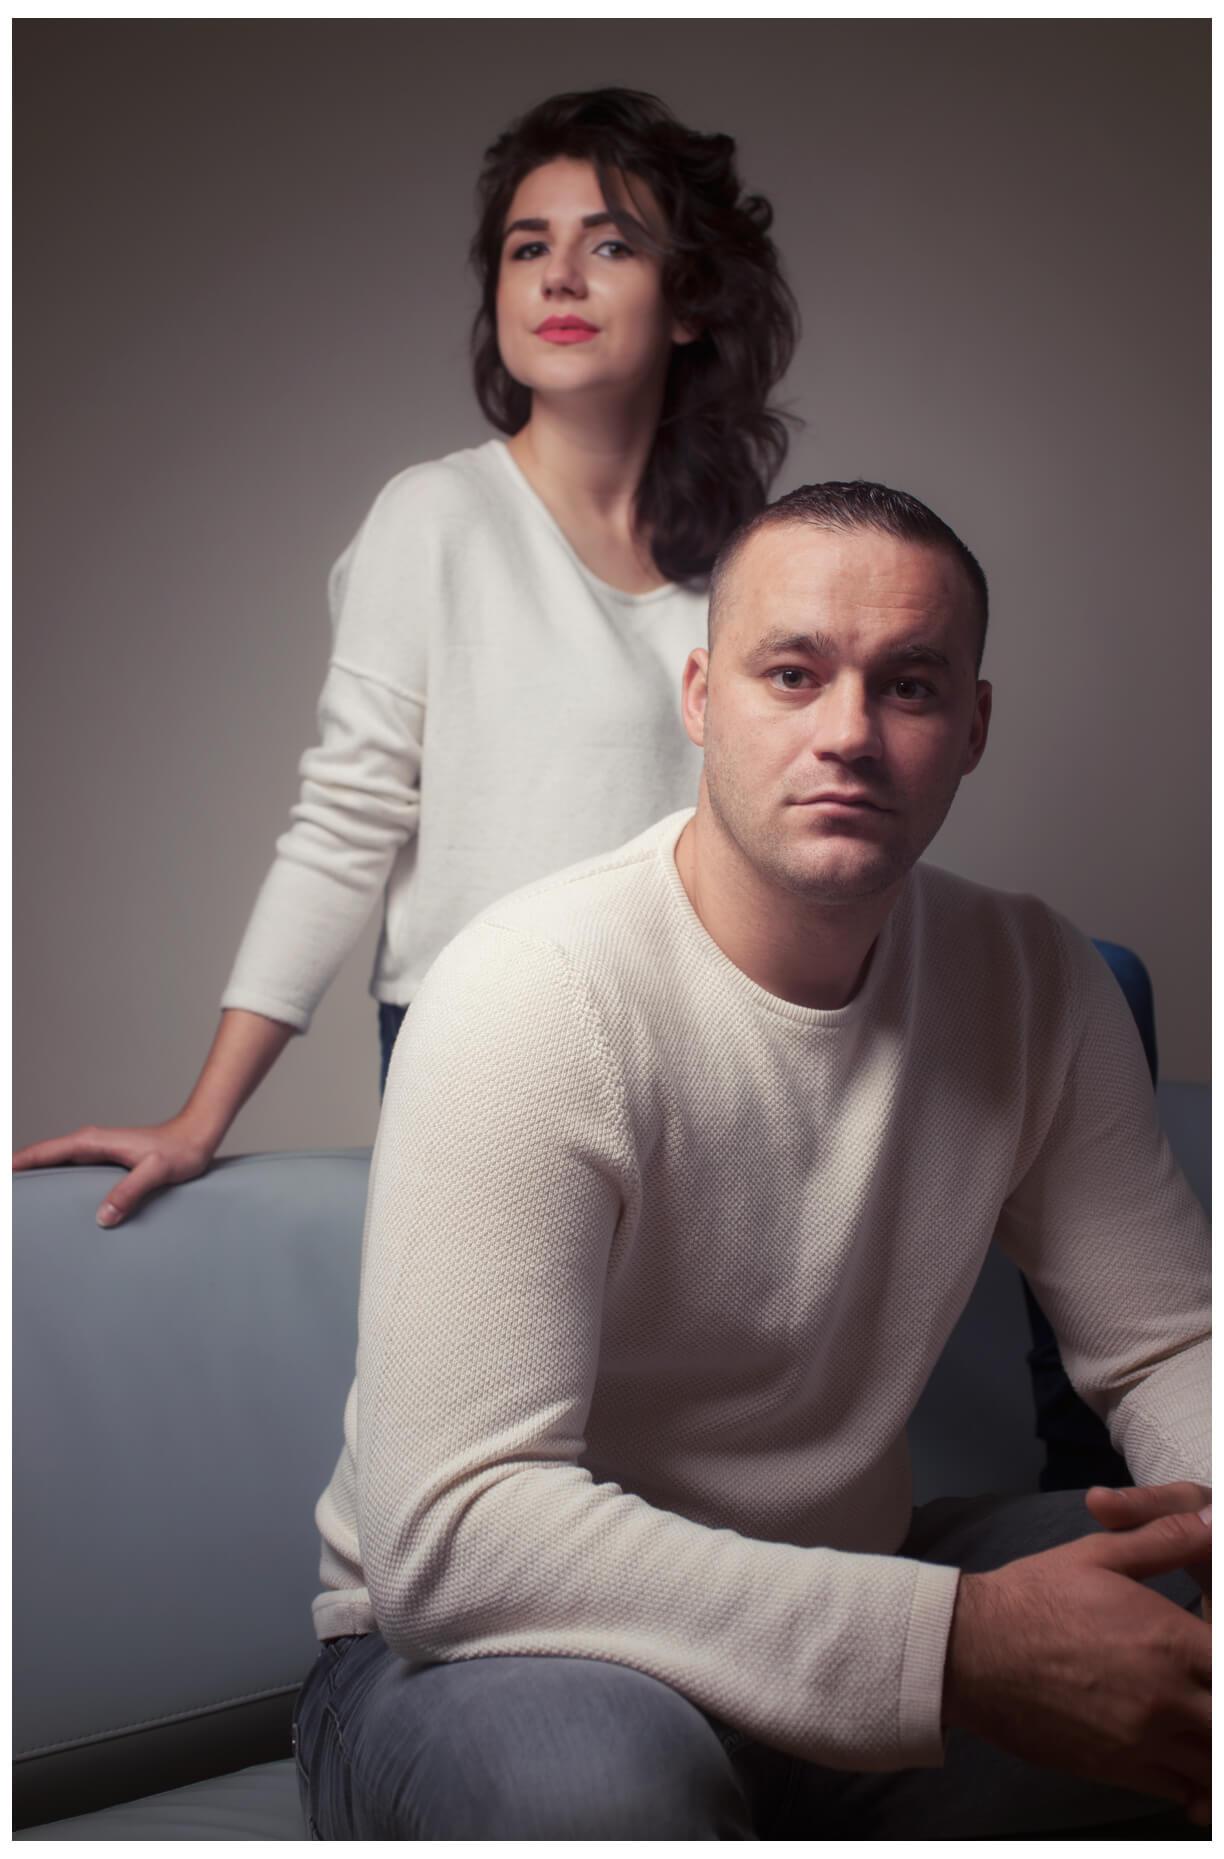 Paarshooting München, ein Paar im Fotostudio in weissen Pullis, sitzend, retro colors farbig